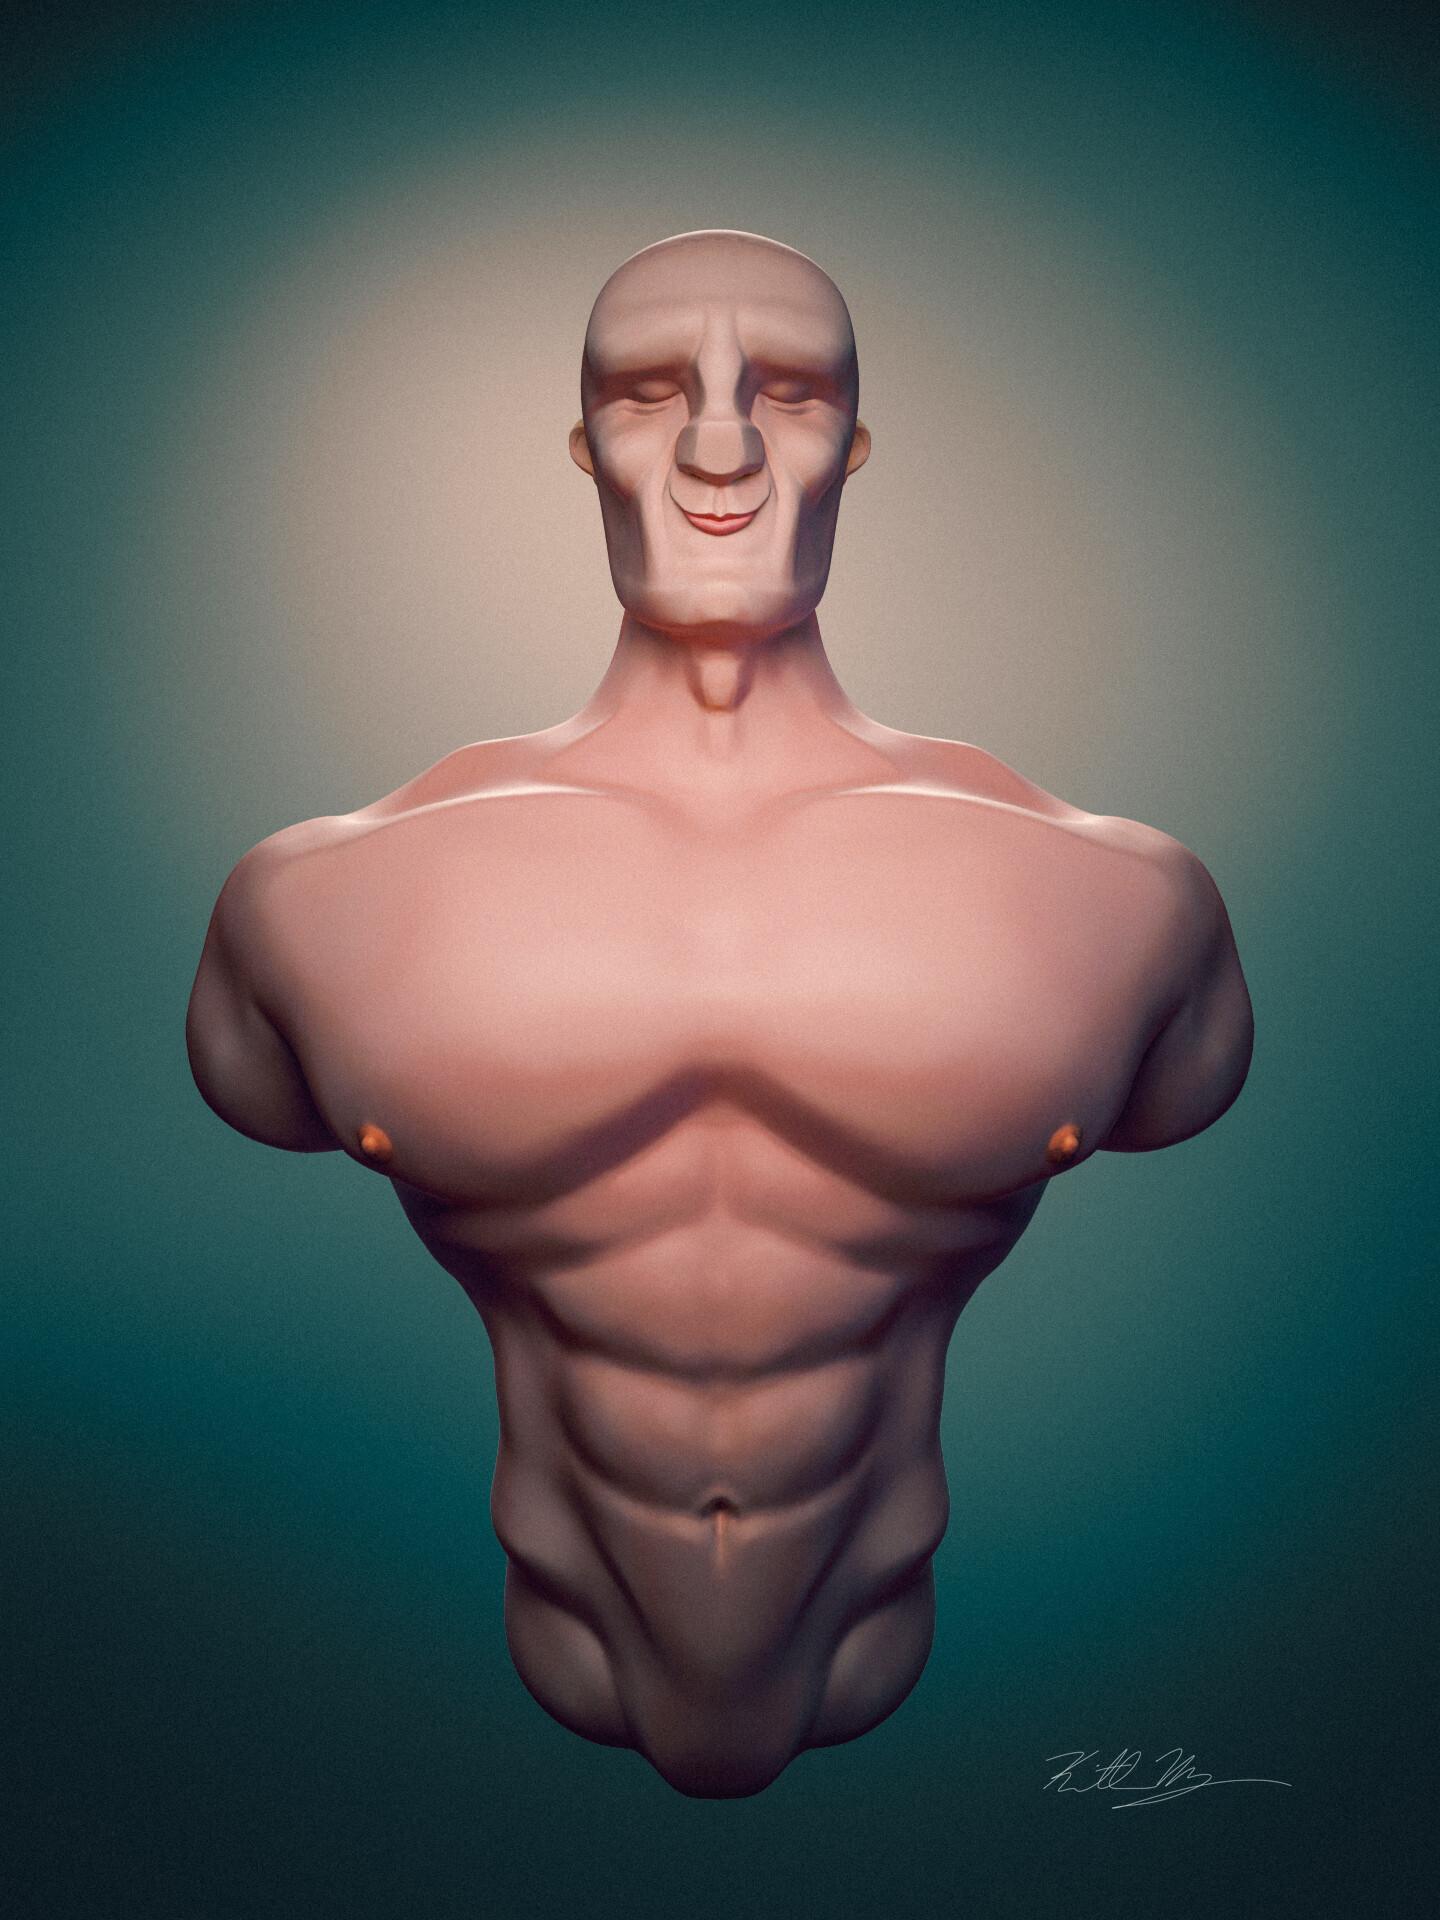 Keith morgan 03 body chest final